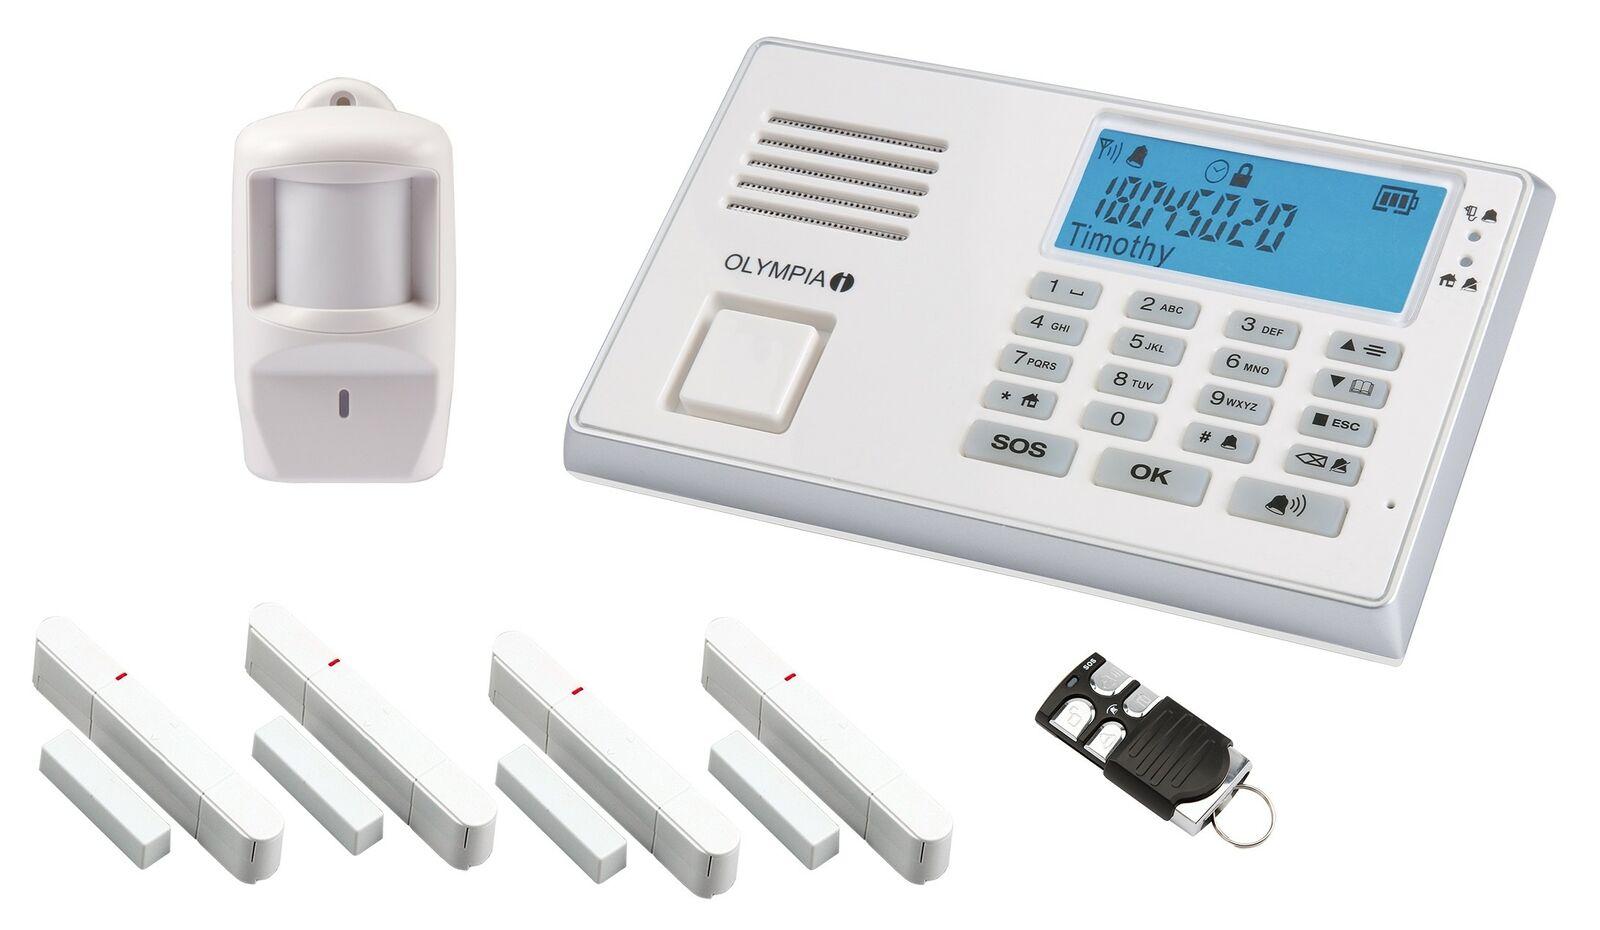 OLYMPIA Alarmanlage GSM Funk Haus Protect 9066 Smart  Plug & Play jetzt mit App